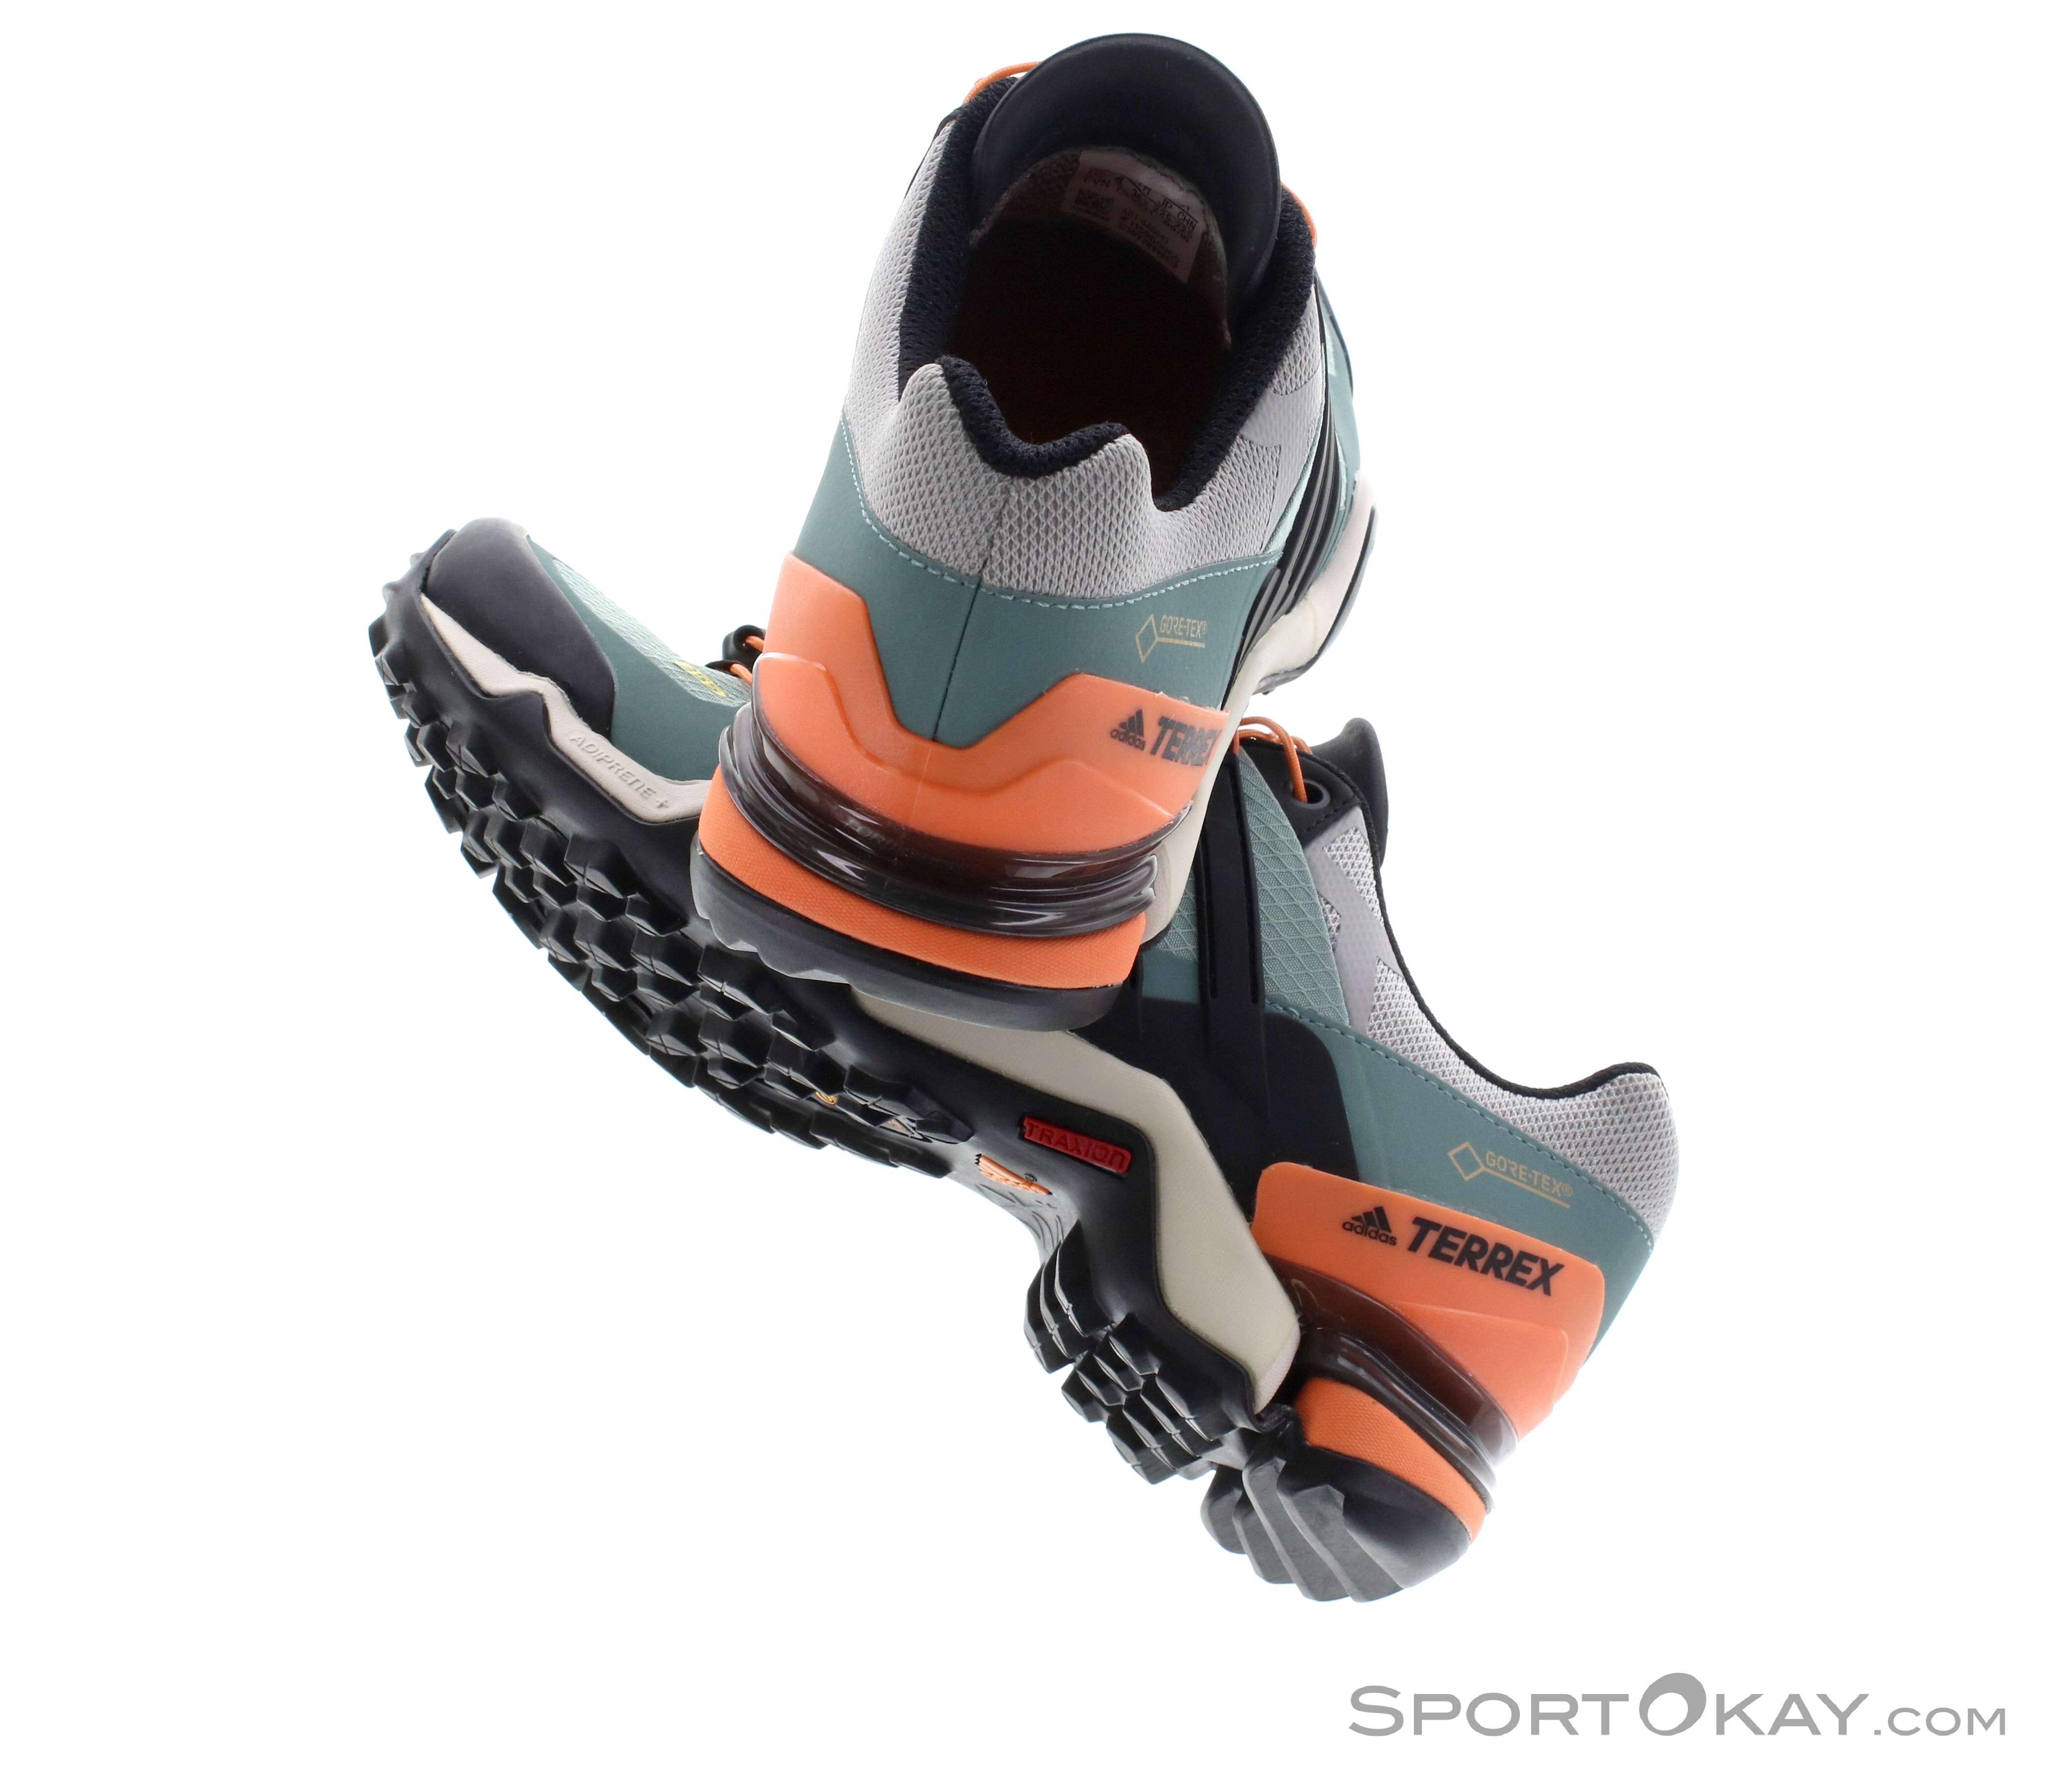 99283385b46be adidas Terrex Fast R GTX Womens Outdoor Shoes Gore-Tex - Trekking ...